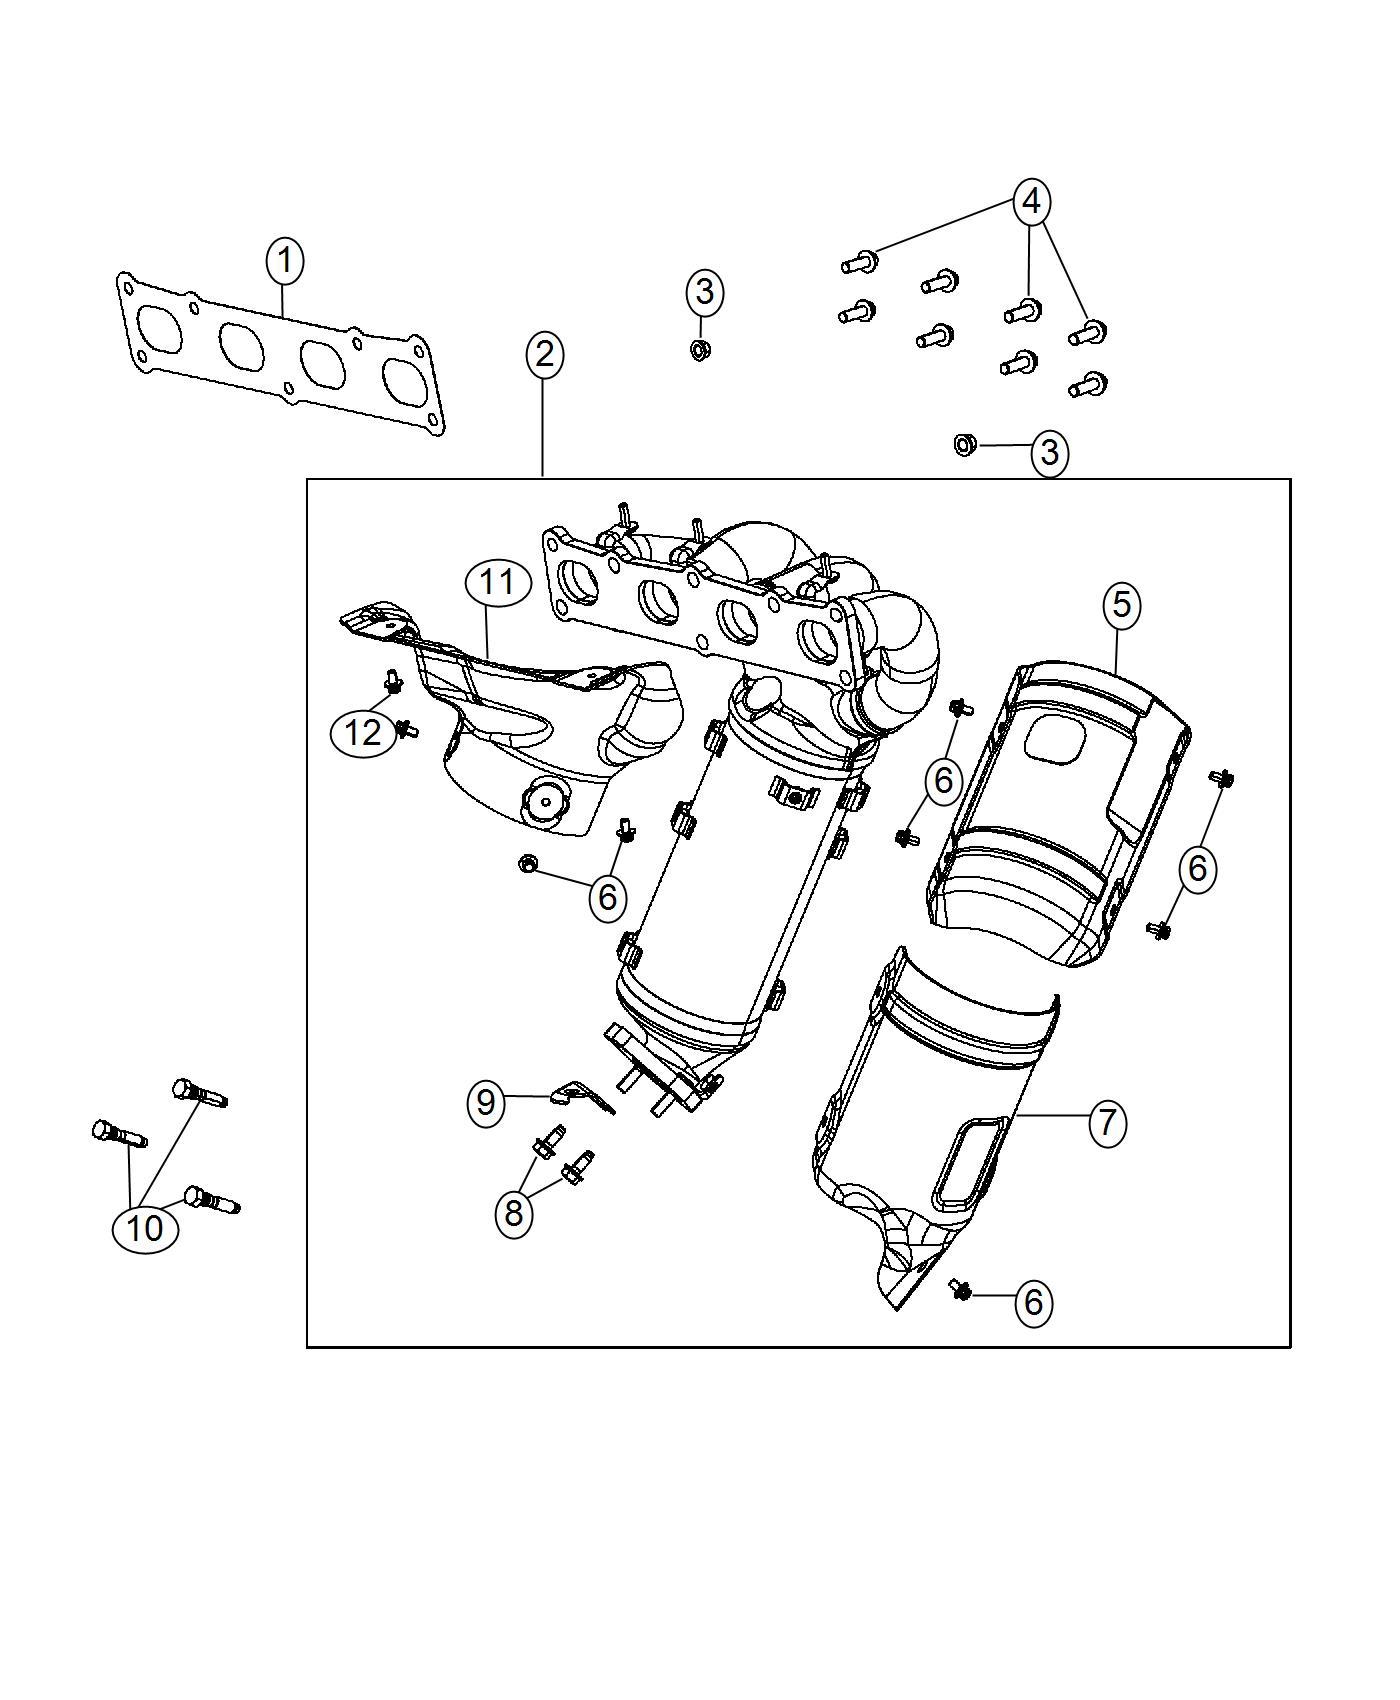 Ram Promaster City Wagon Slt Manifold Used For